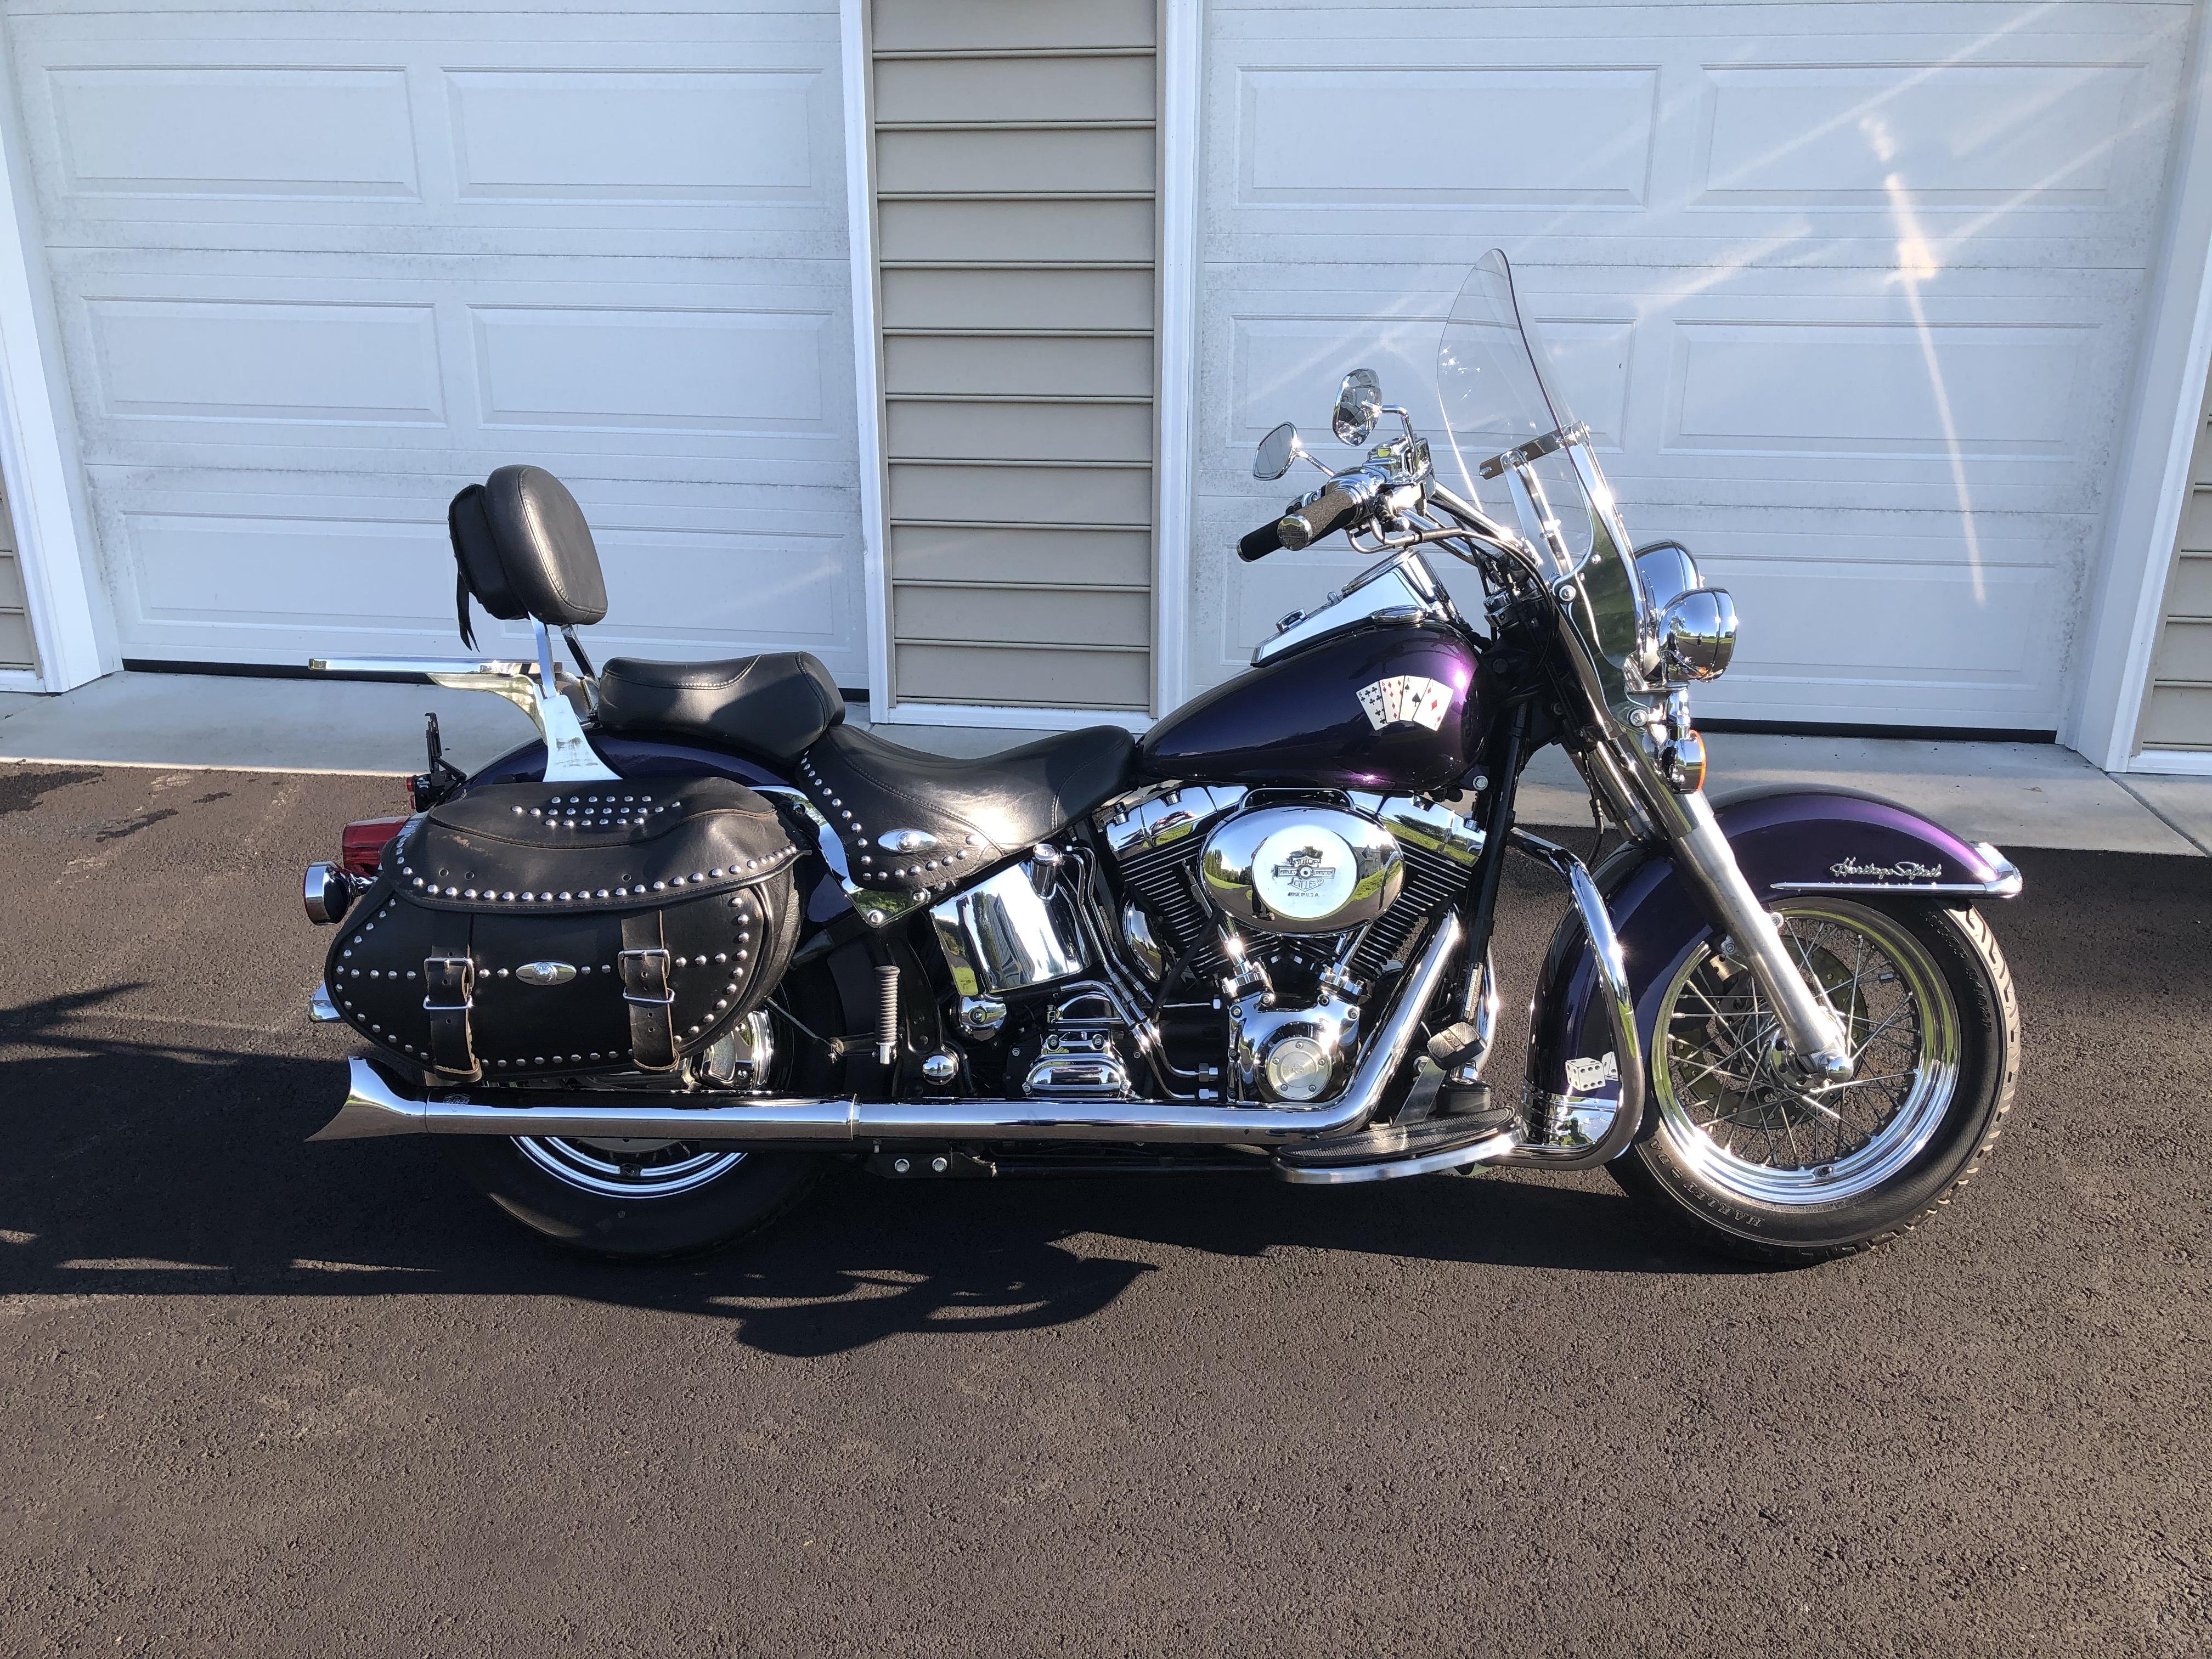 Photo 2000 Harley-Davidson HERITAGE SOFTAIL CLASSIC $8000169.60169.60